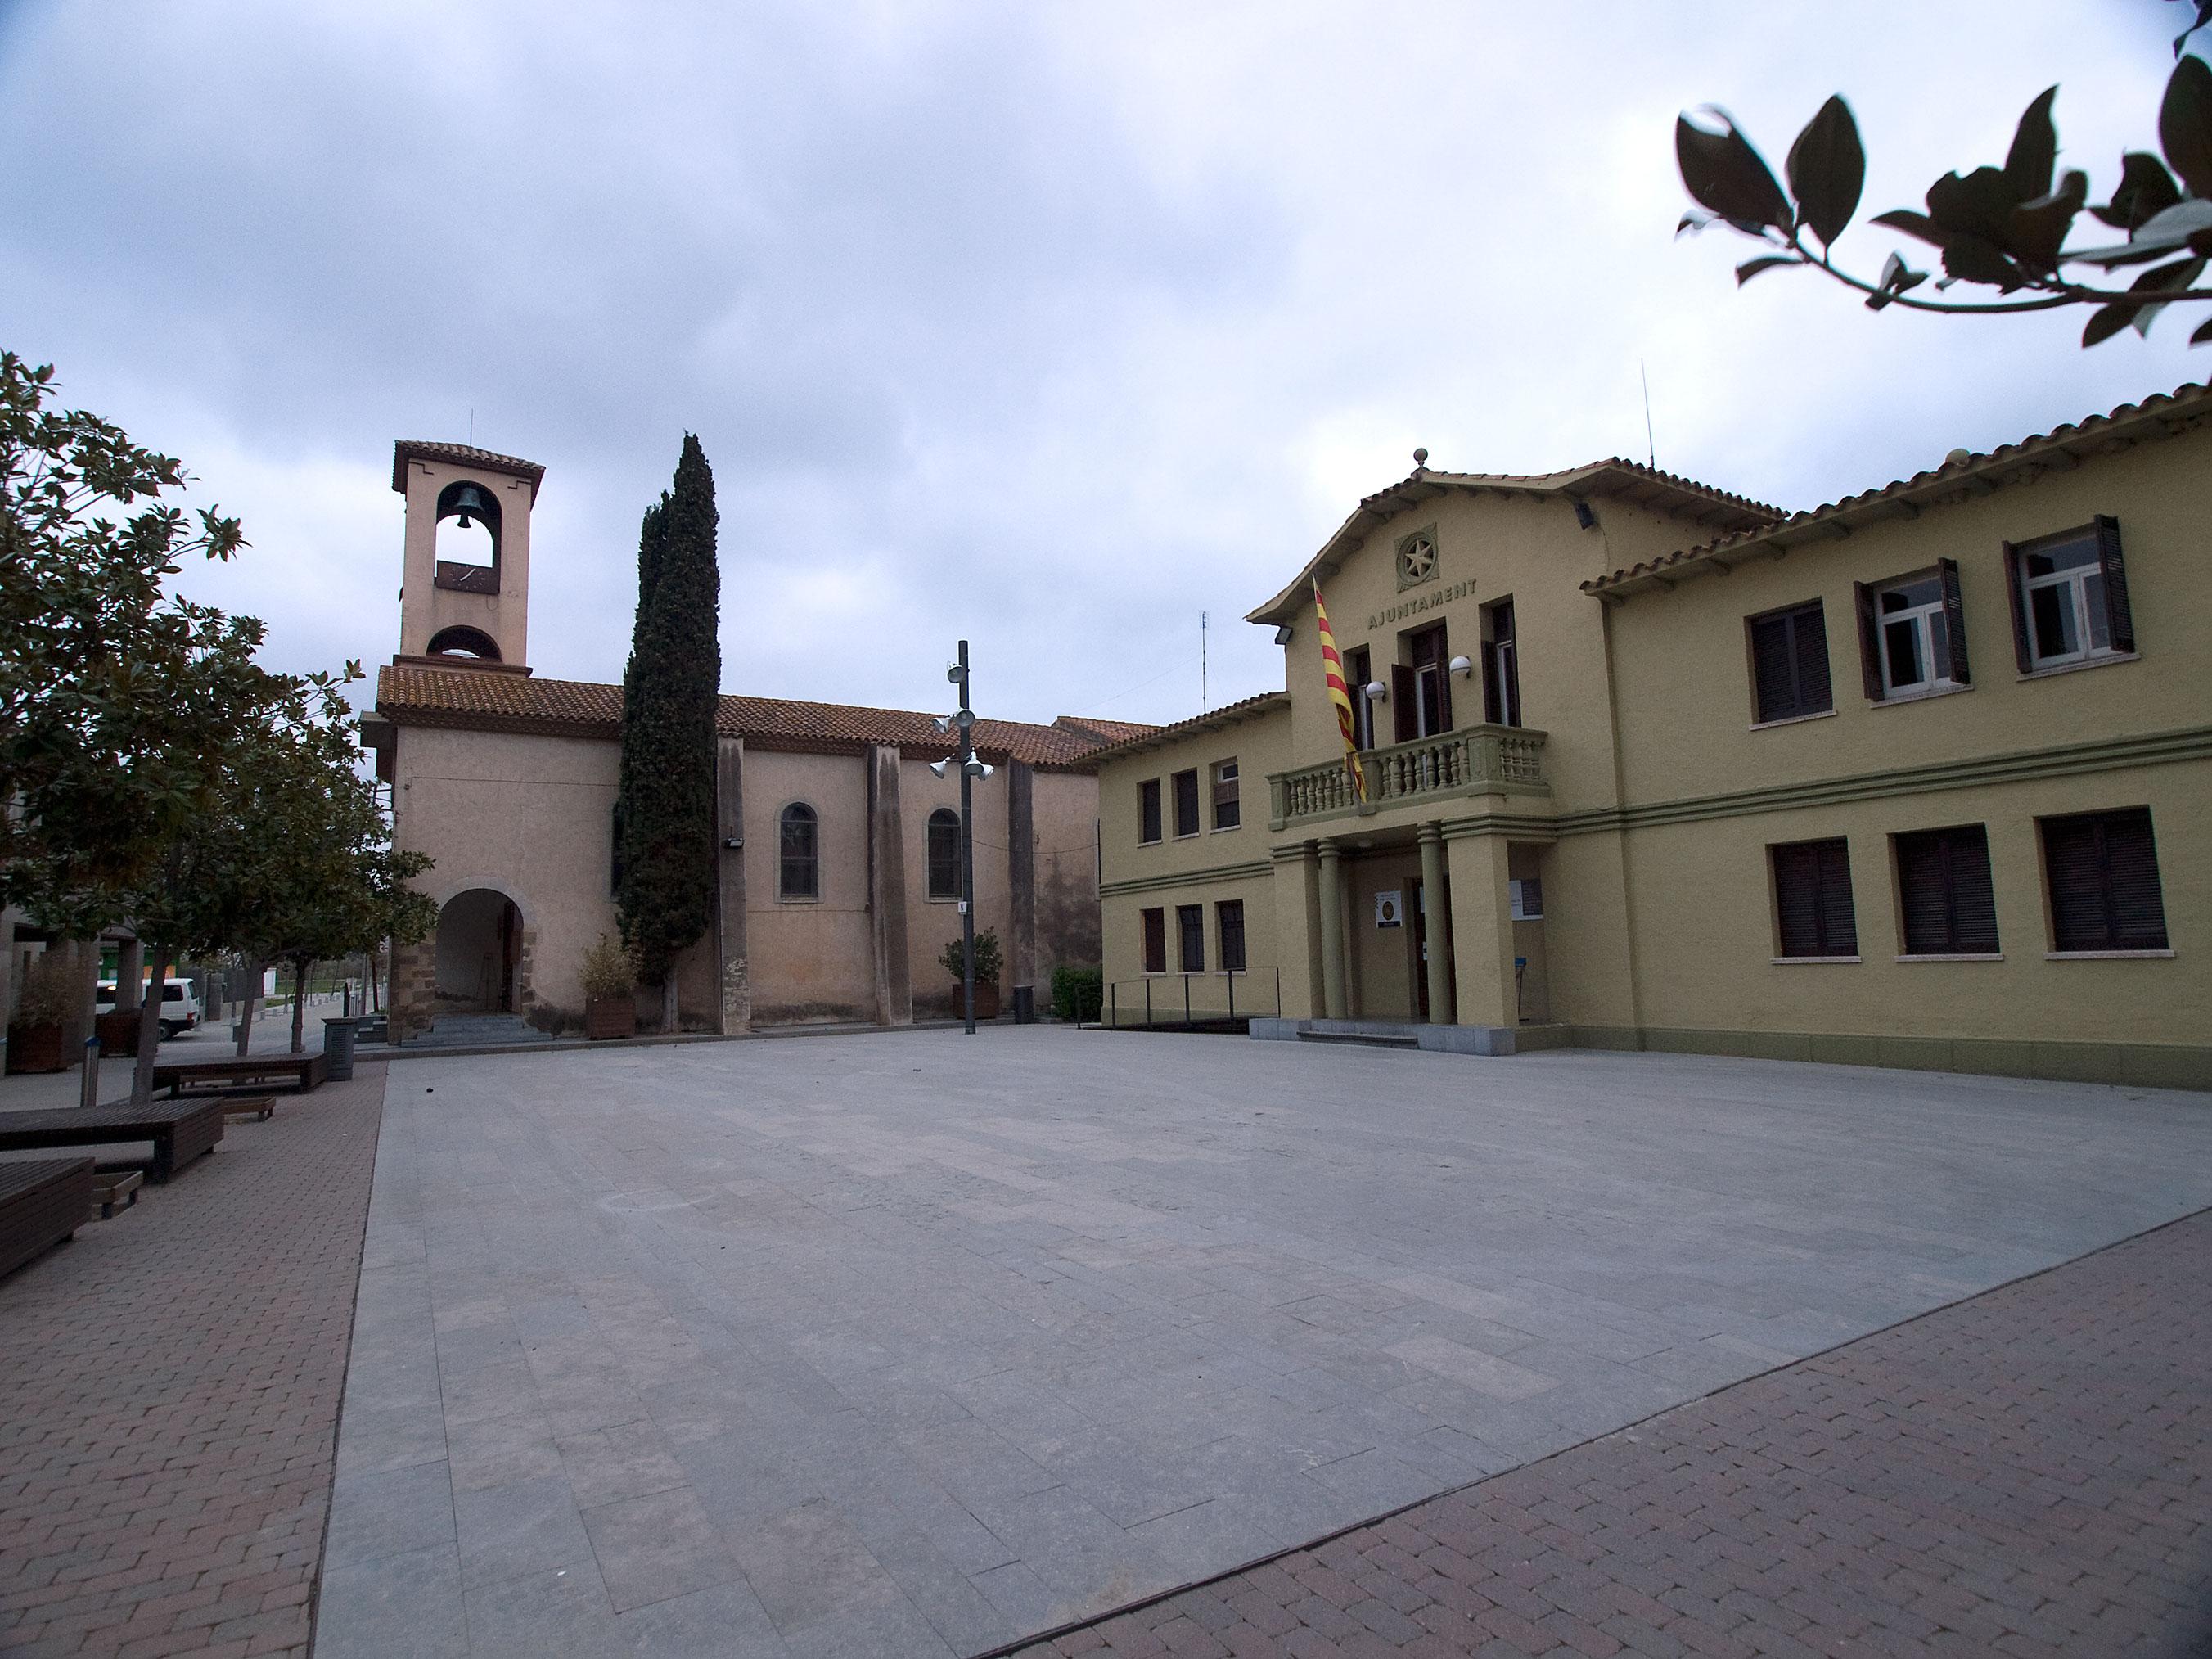 http://upload.wikimedia.org/wikipedia/commons/0/0c/Santa-Susanna.jpg